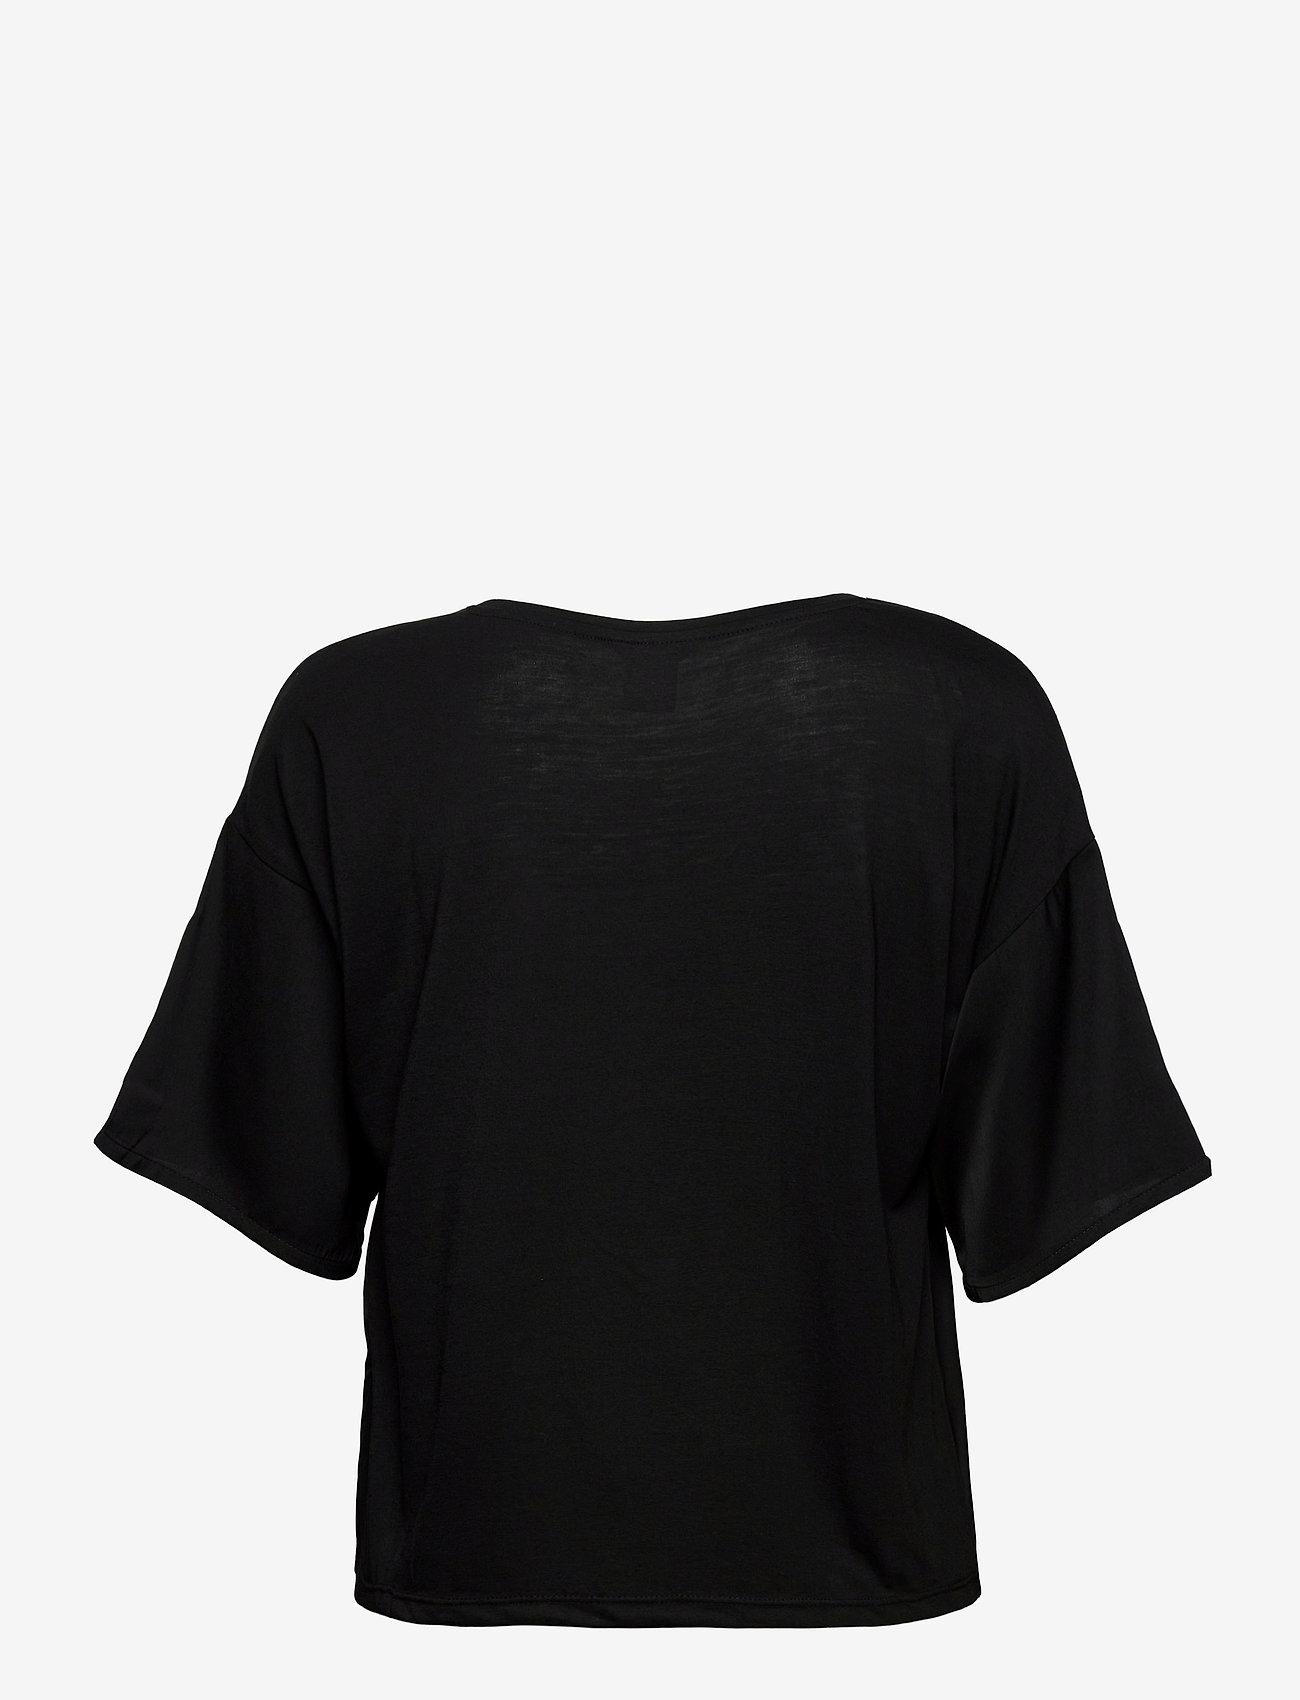 Top Lena   - Lindex -  Women's Blouses & Shirts 2020 Cool